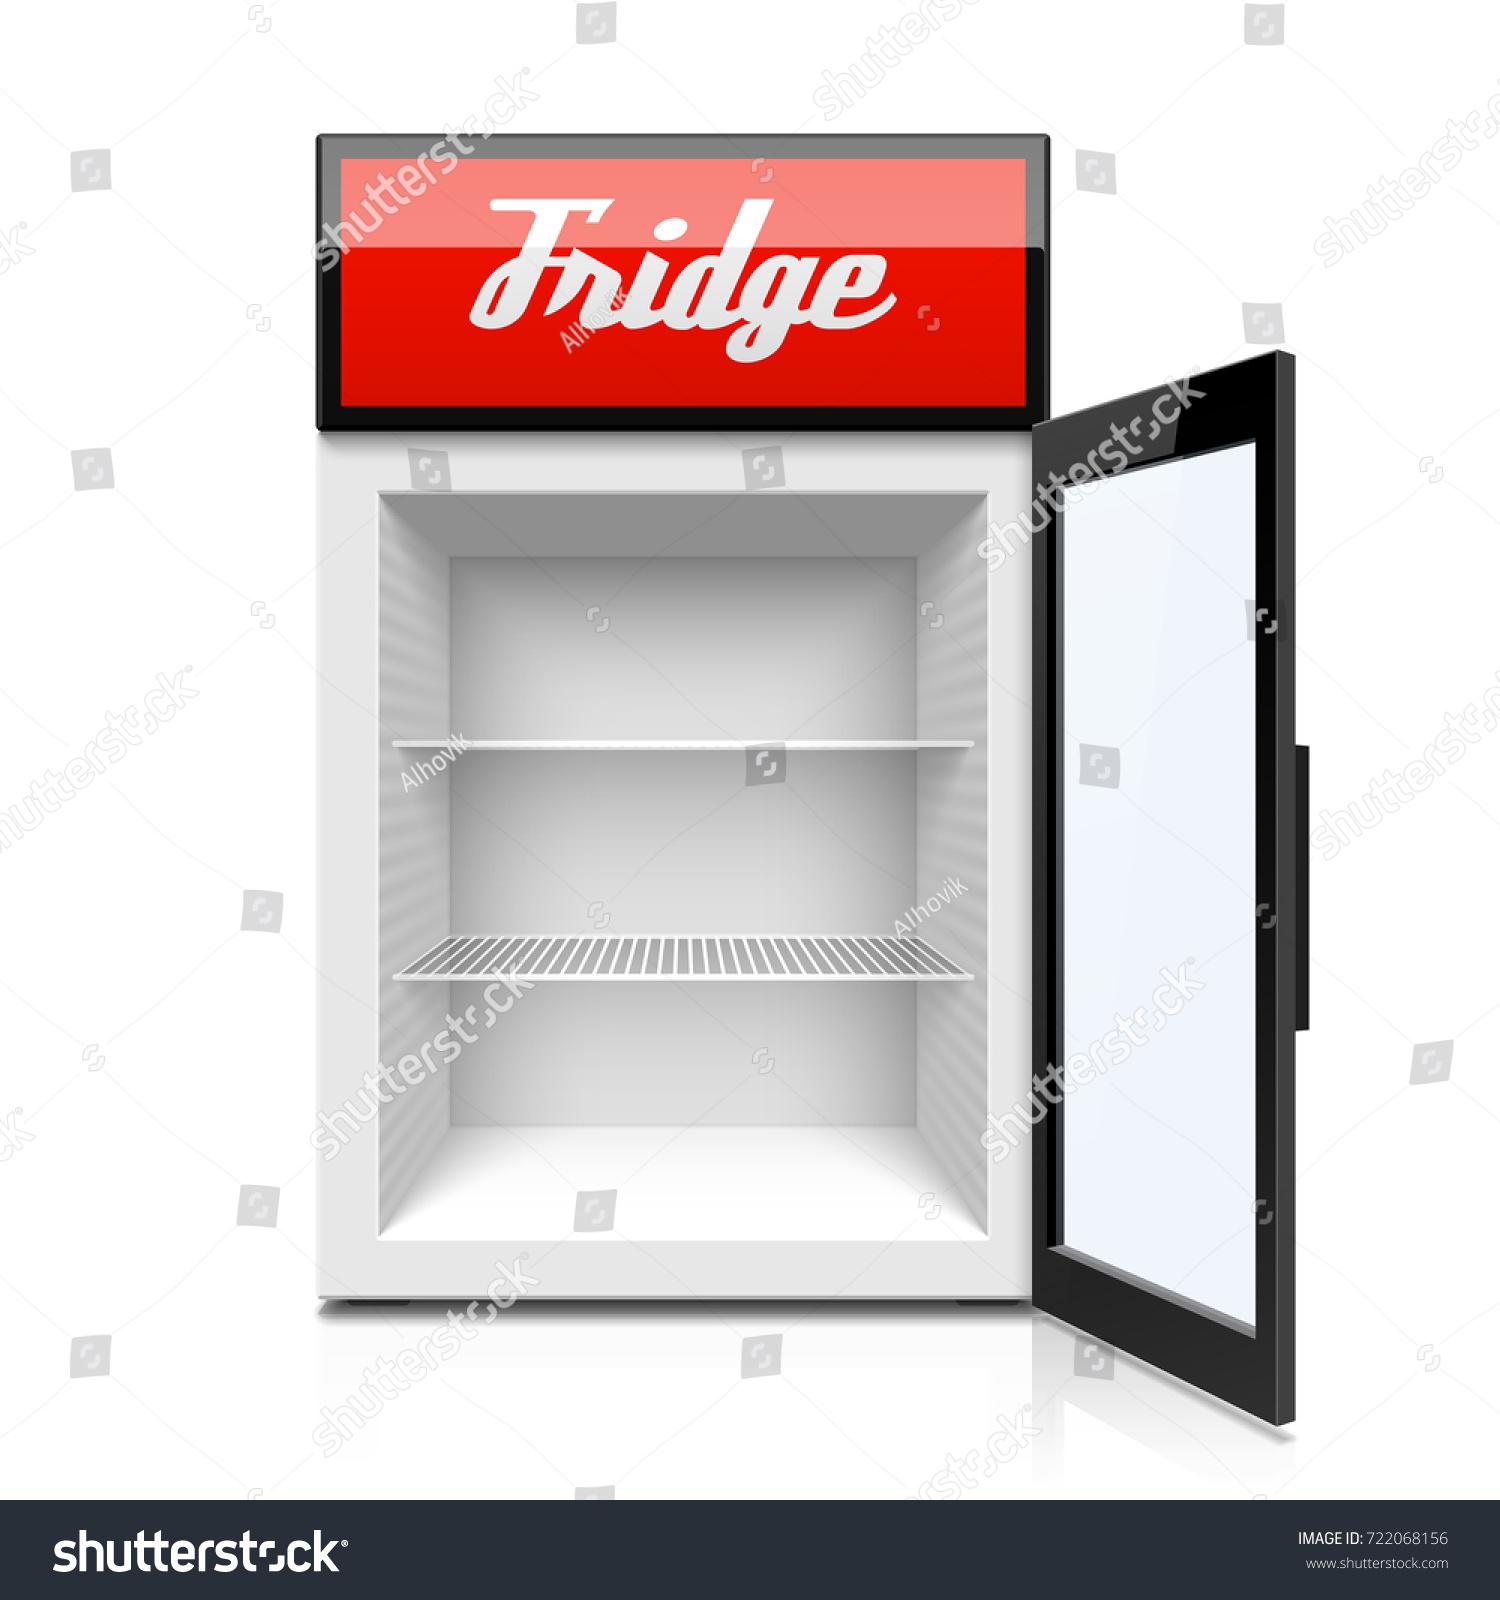 single mini freezer fridge full size refrigerator of door cooler upright with glass